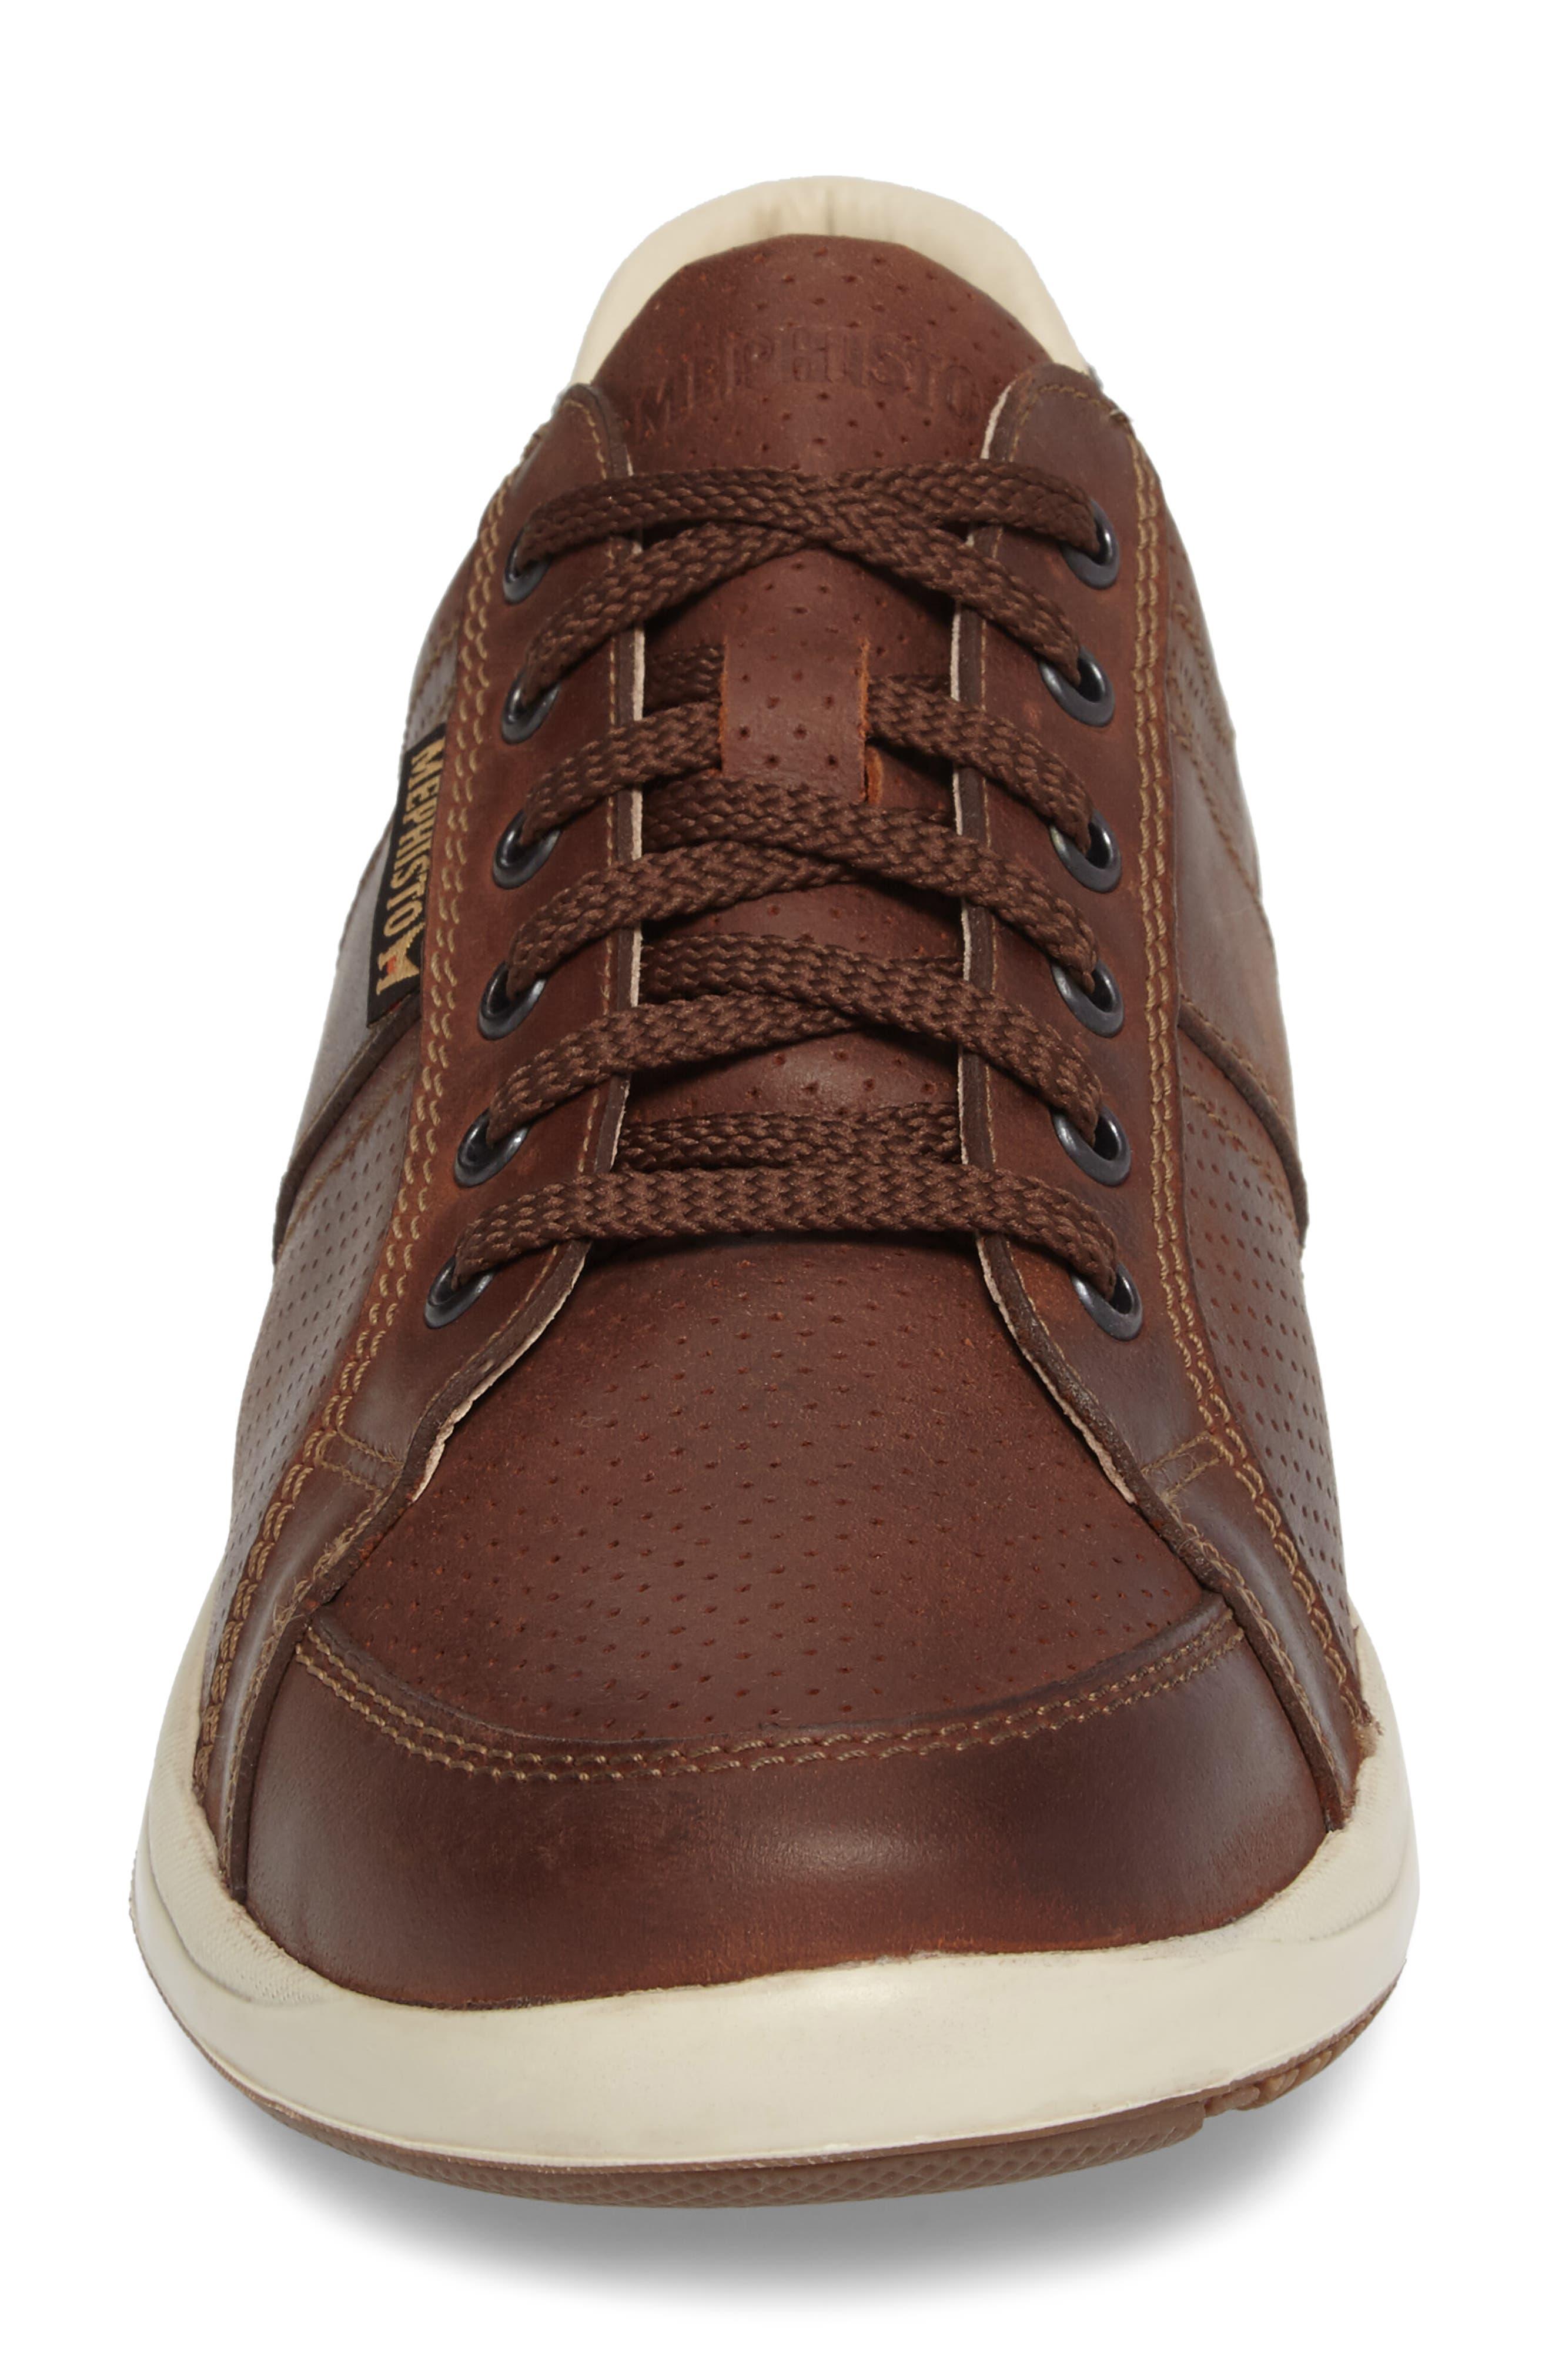 'Hero' Perforated Sneaker,                             Alternate thumbnail 5, color,                             Chestnut Nubuck Leather